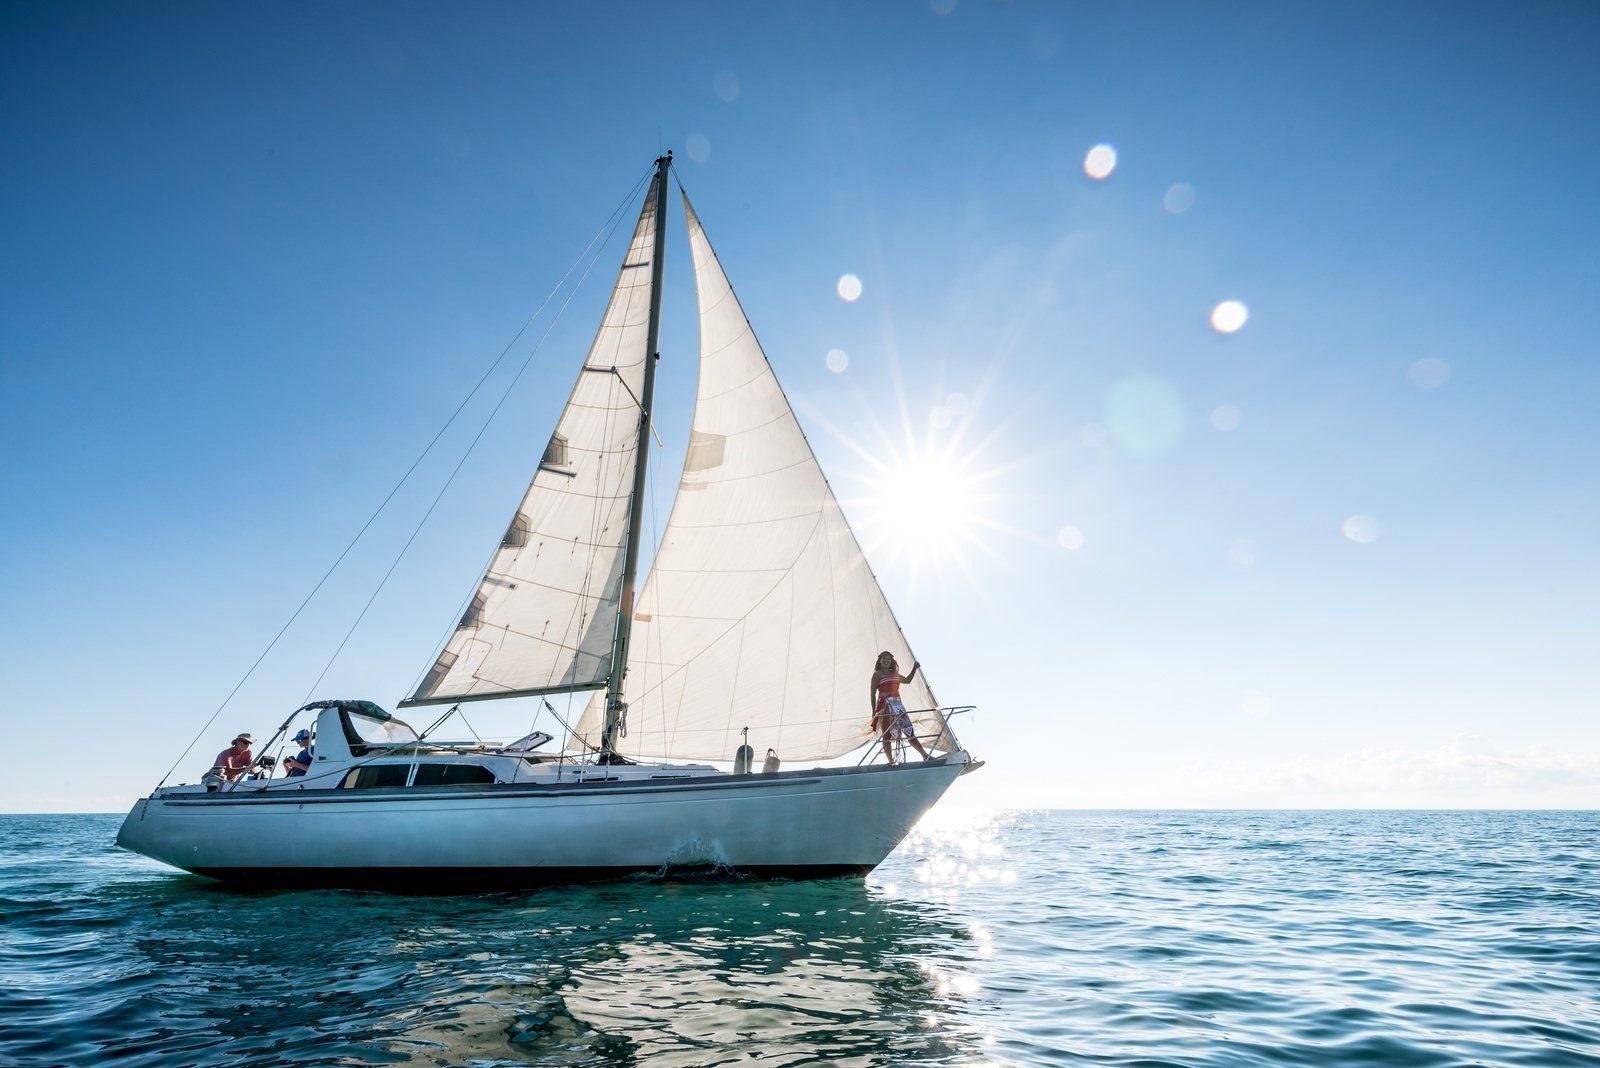 Two Monkeys Travel - Sailing Blog